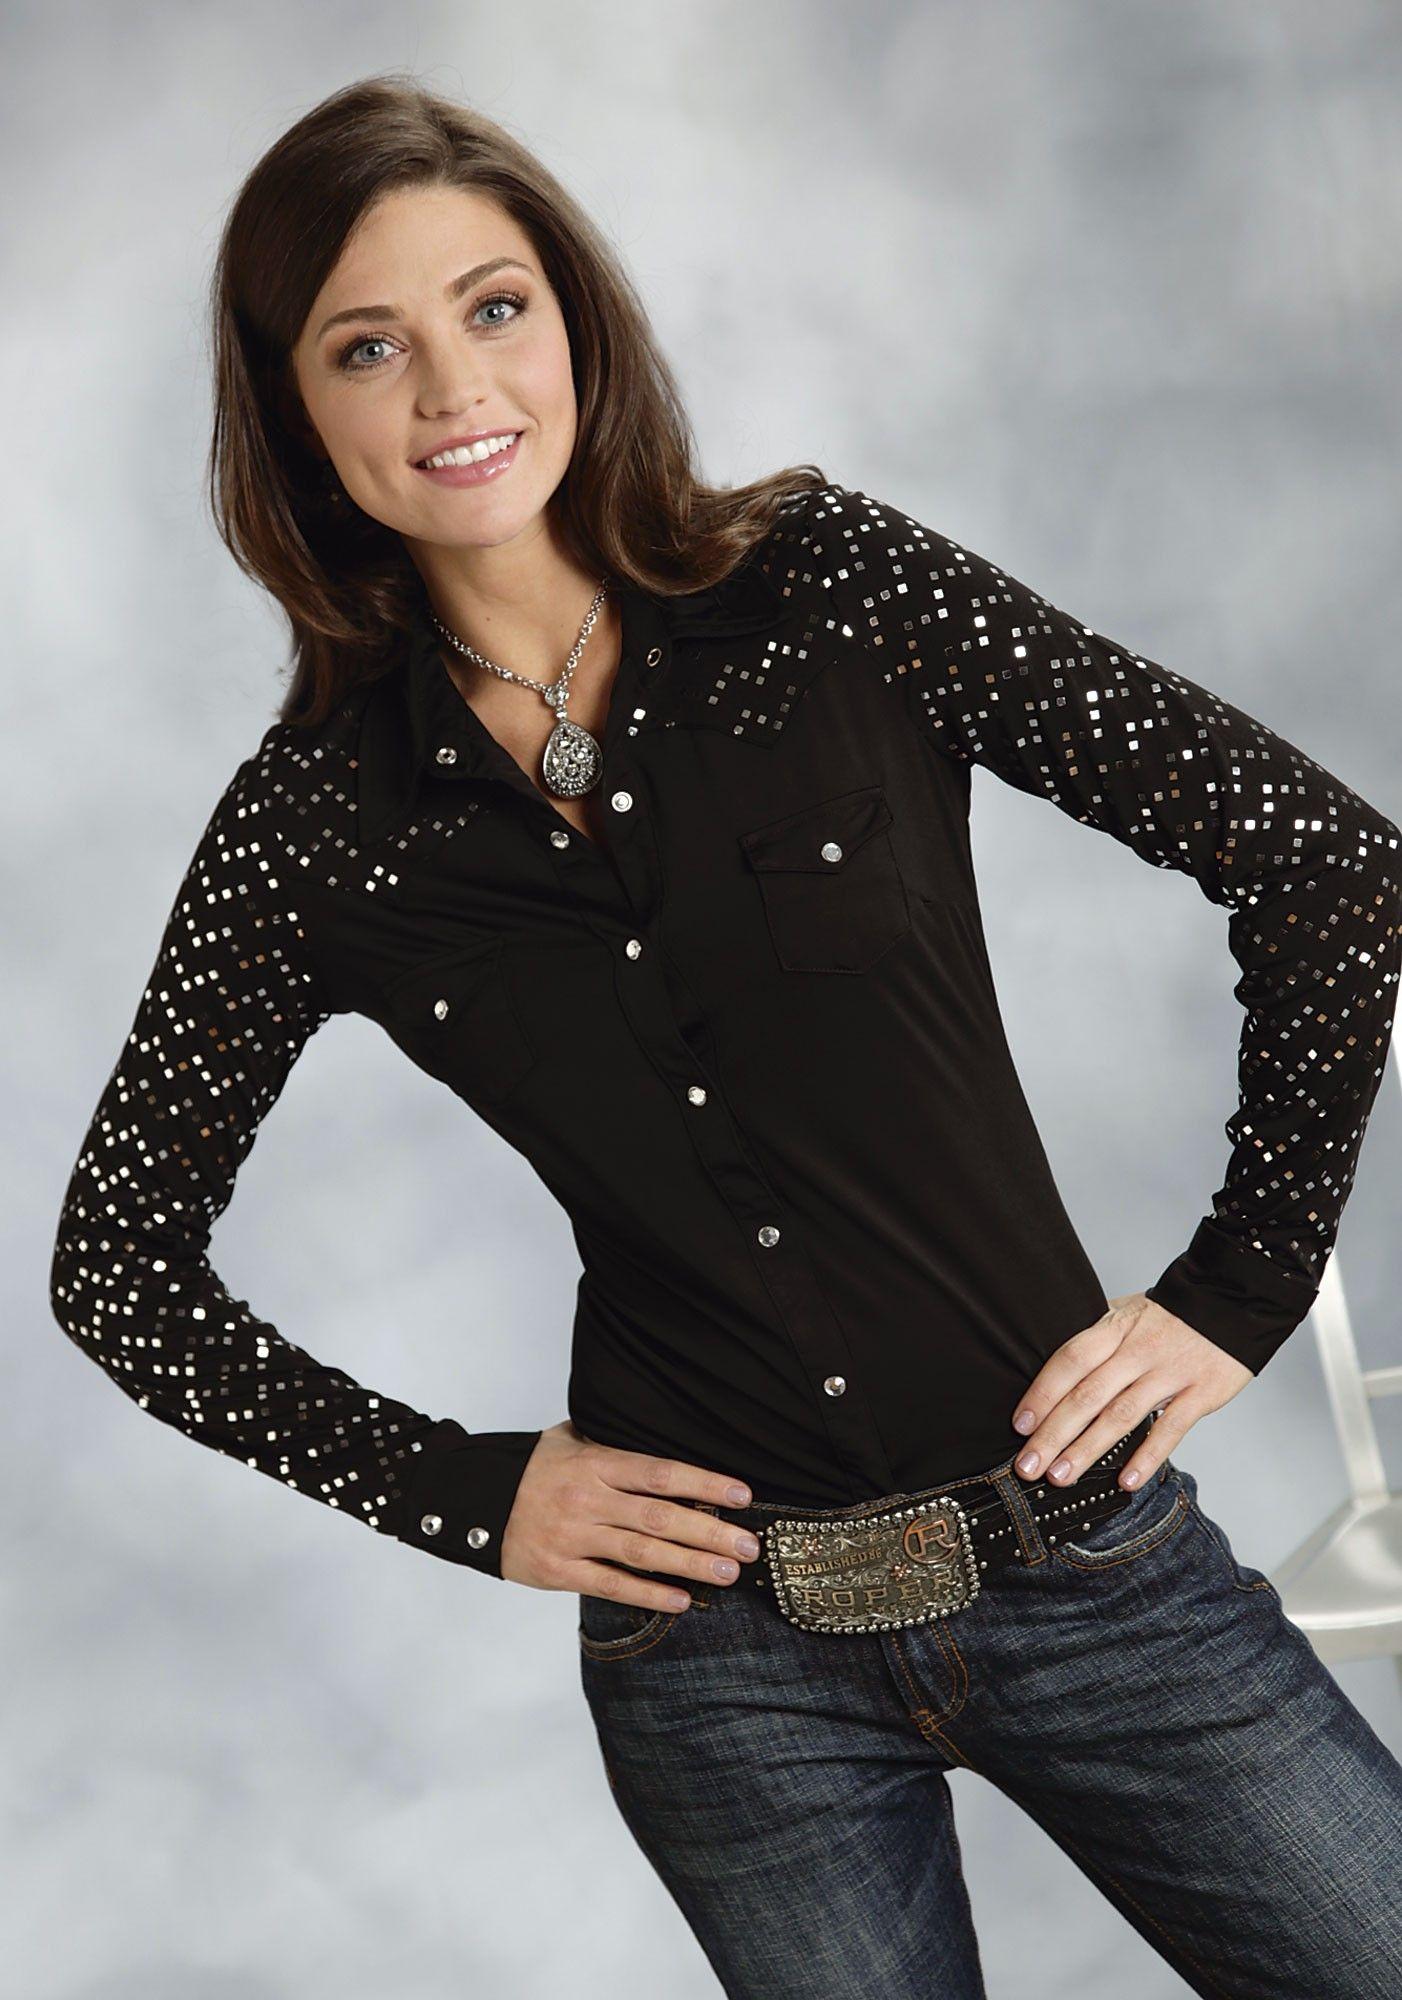 Stunning Black Western Shirt With Crystal Rhinestone Snaps